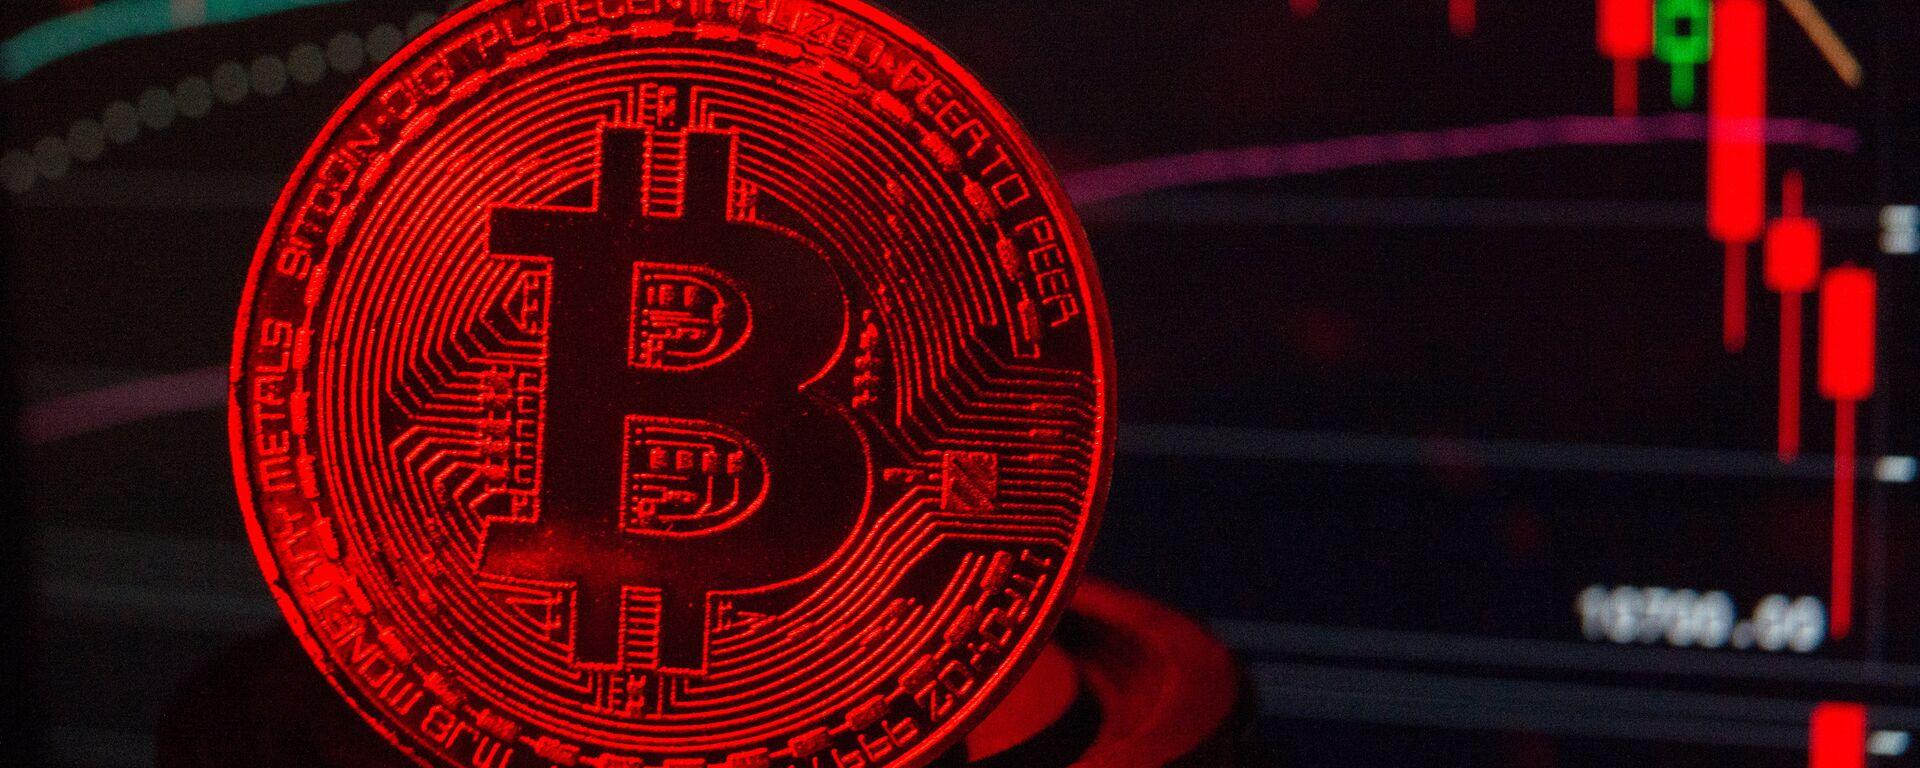 Bitcoin (imagen refercial) - Sputnik Mundo, 1920, 19.05.2021